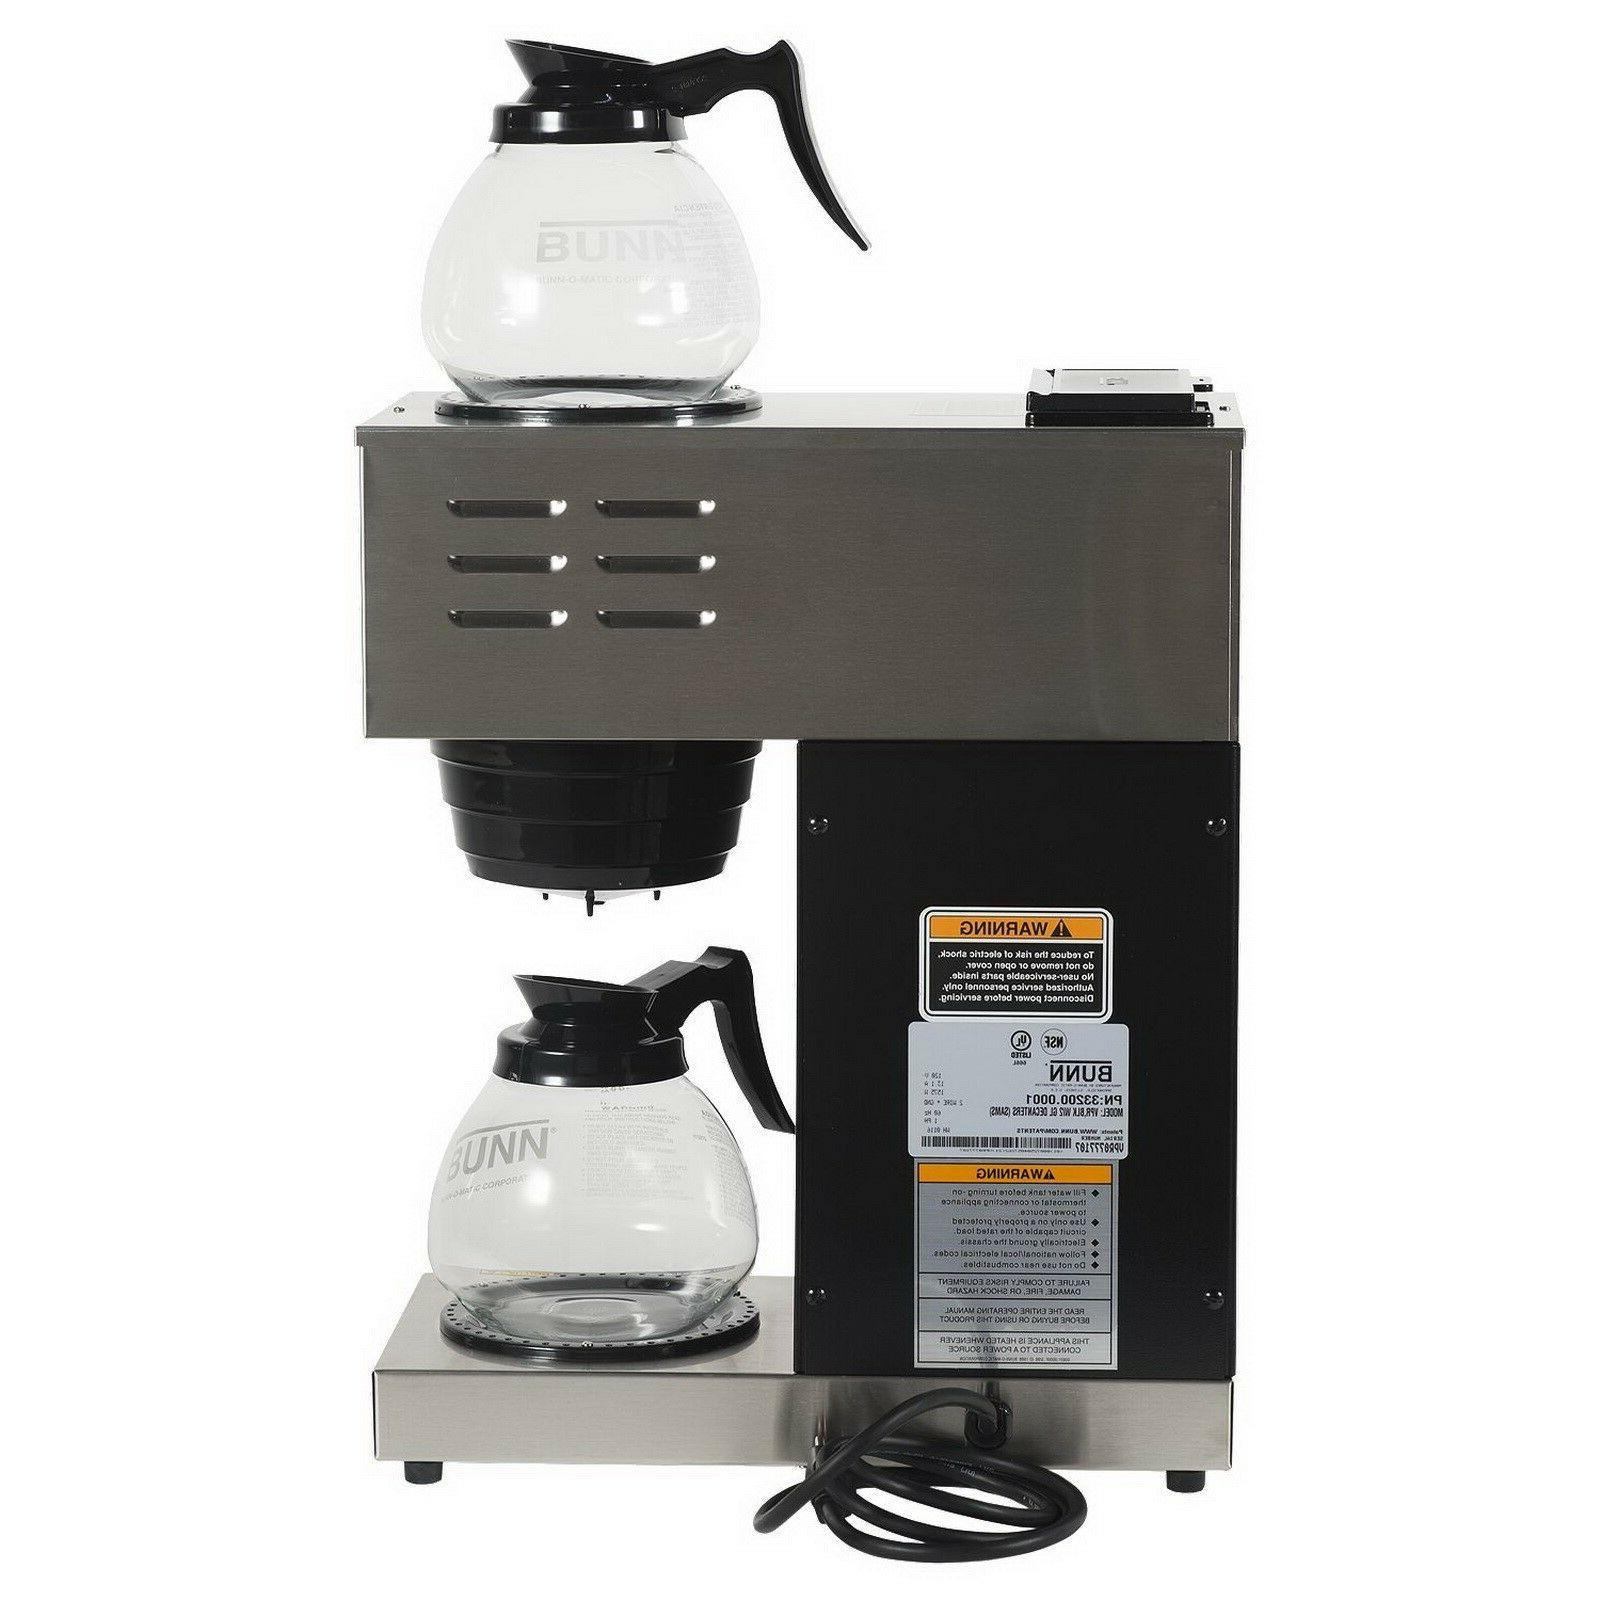 Bunn VPR Commercial Coffee Pour Over Brewer Warmer Pourover